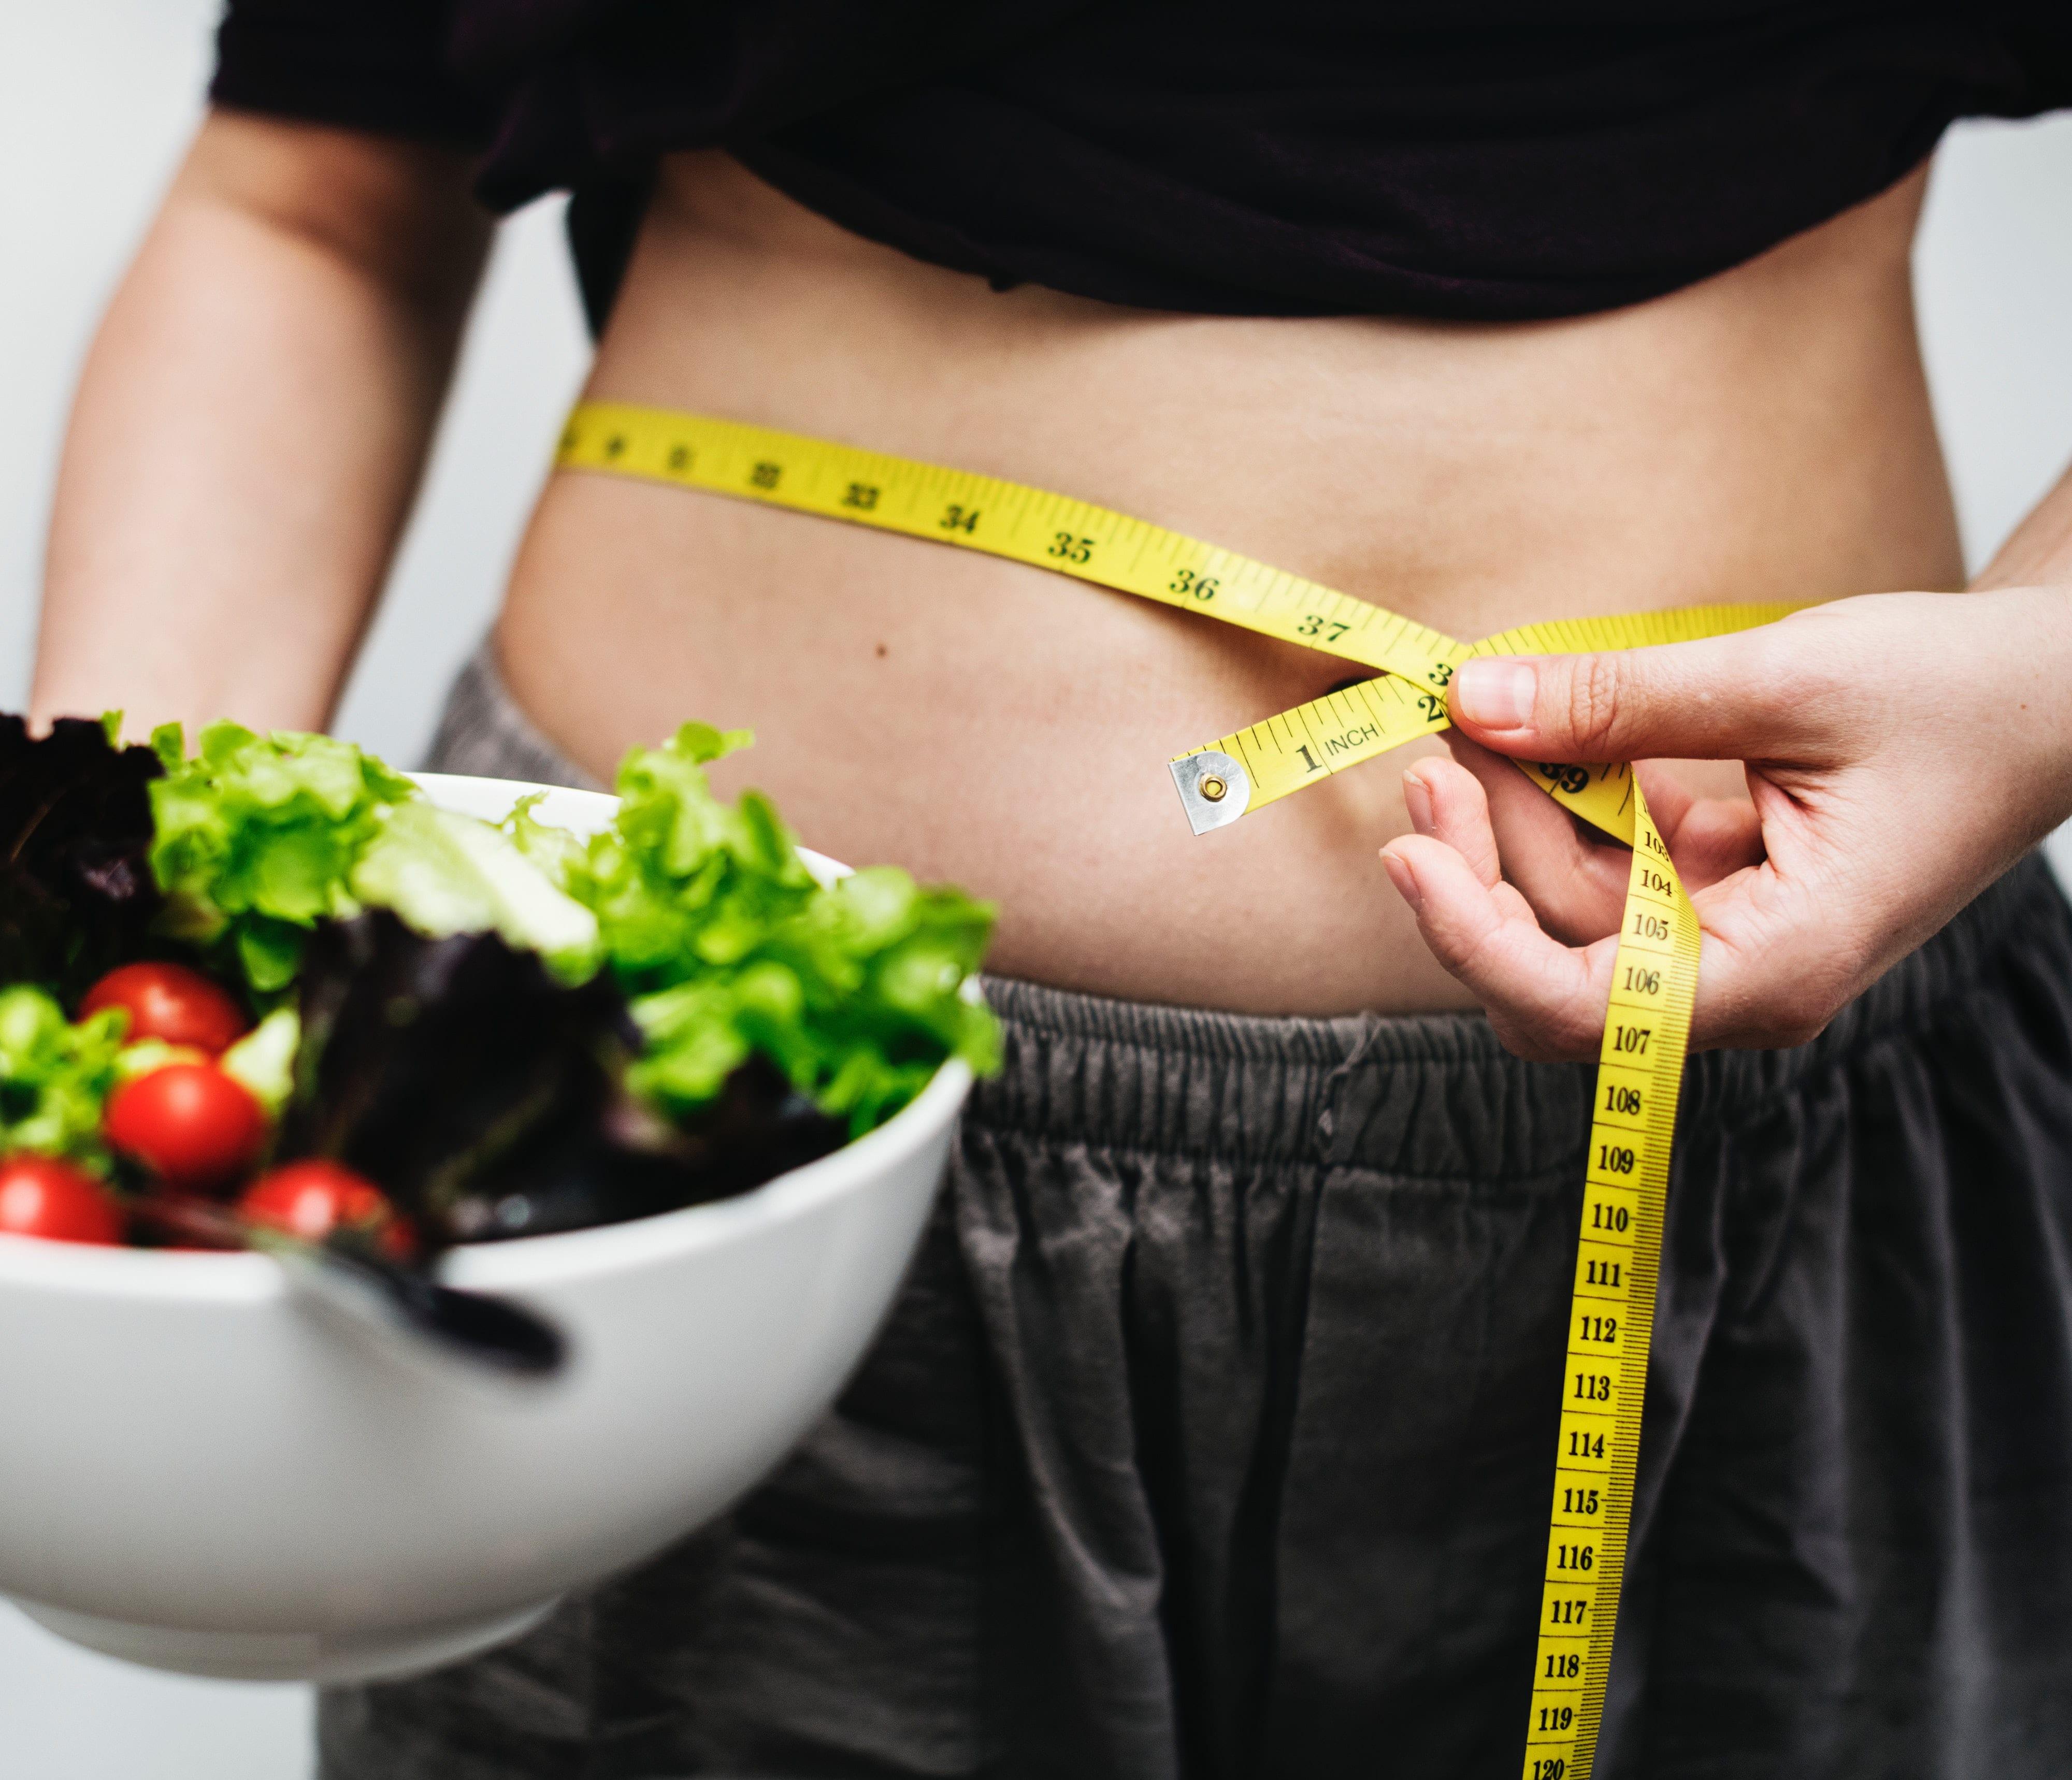 Cara Termudah Untuk Menghitung Berat Badan Ideal Dengan Akurat